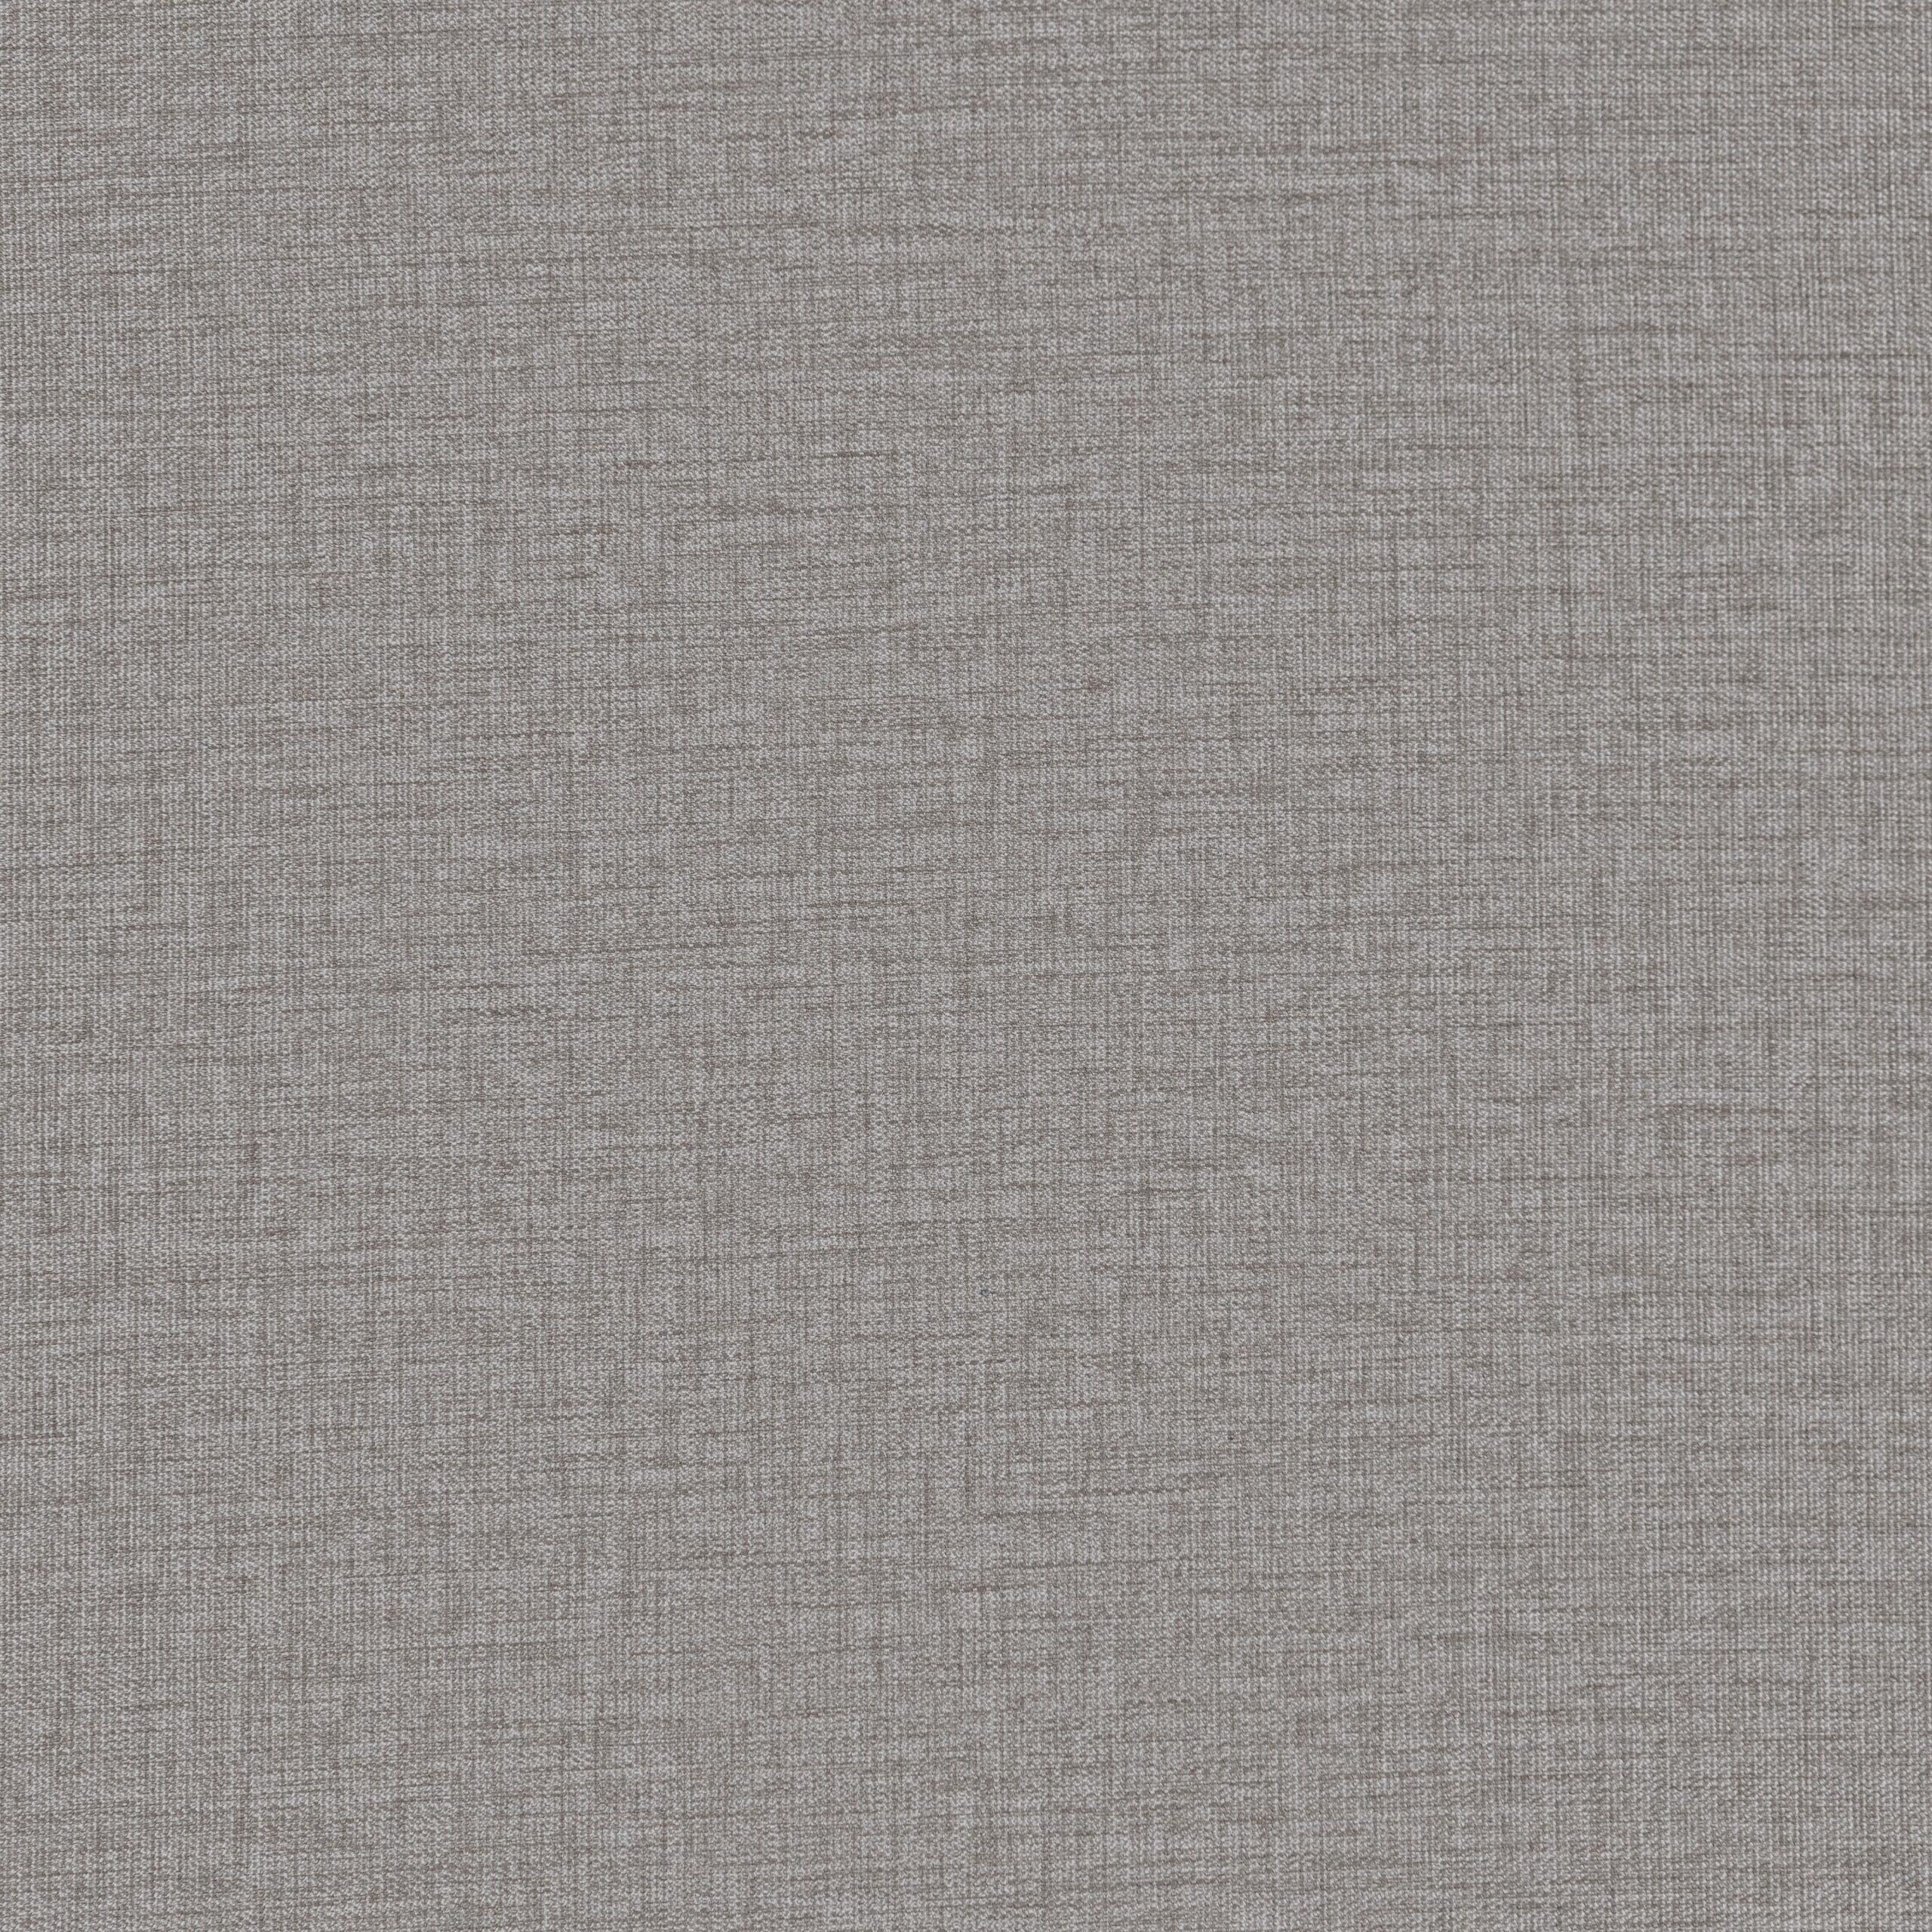 Lido Trend Cement